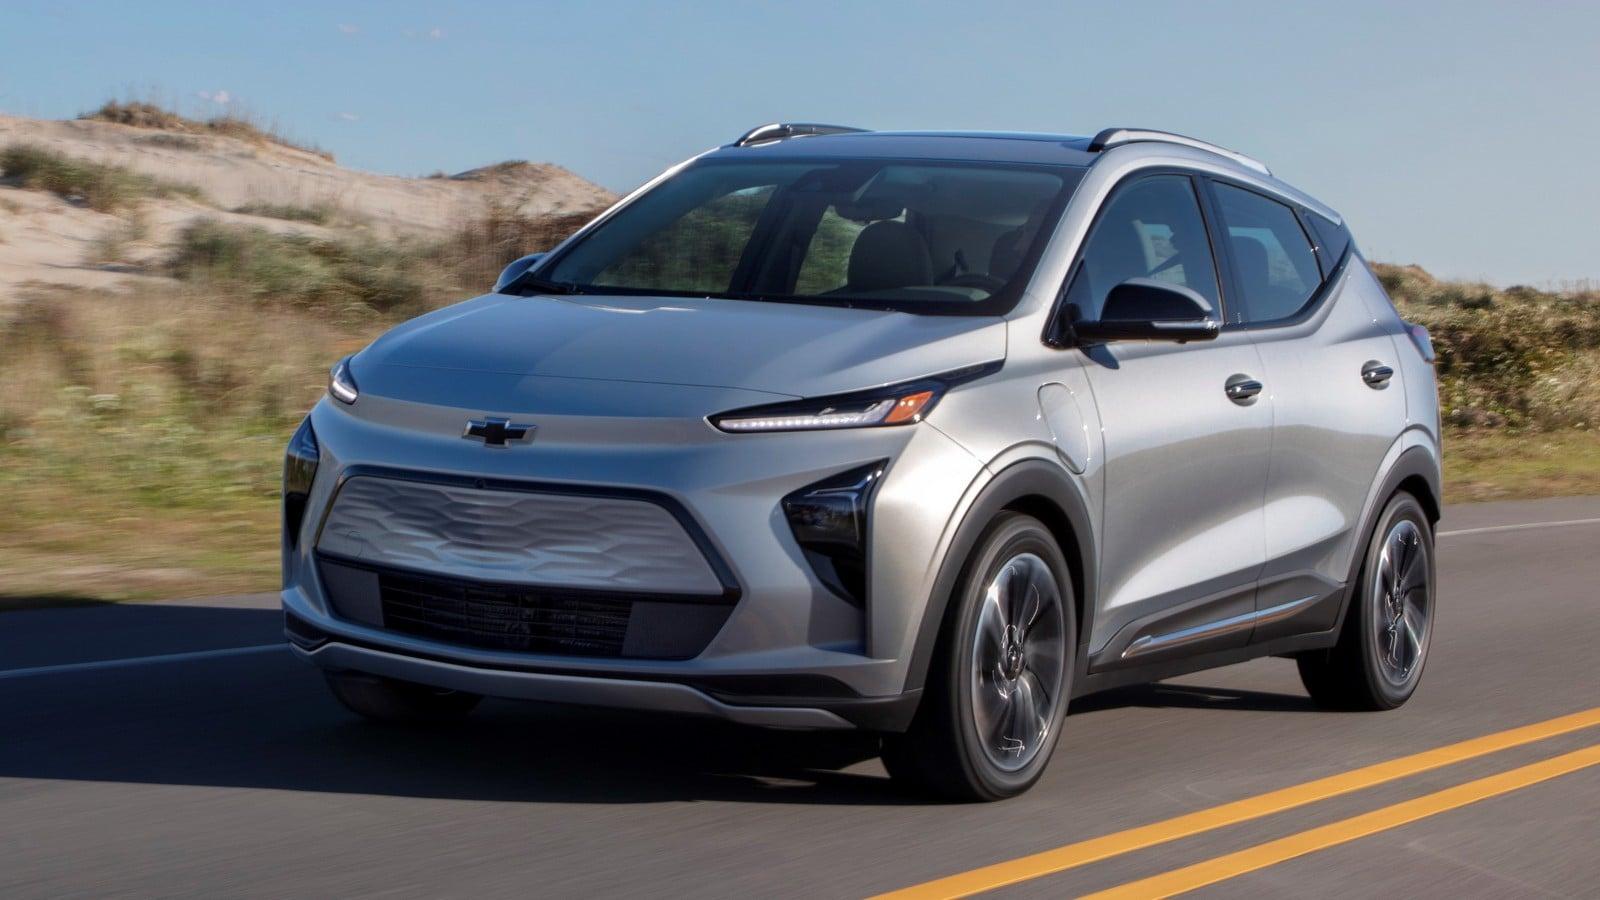 2022 Chevrolet Bolt EUV driving through hills